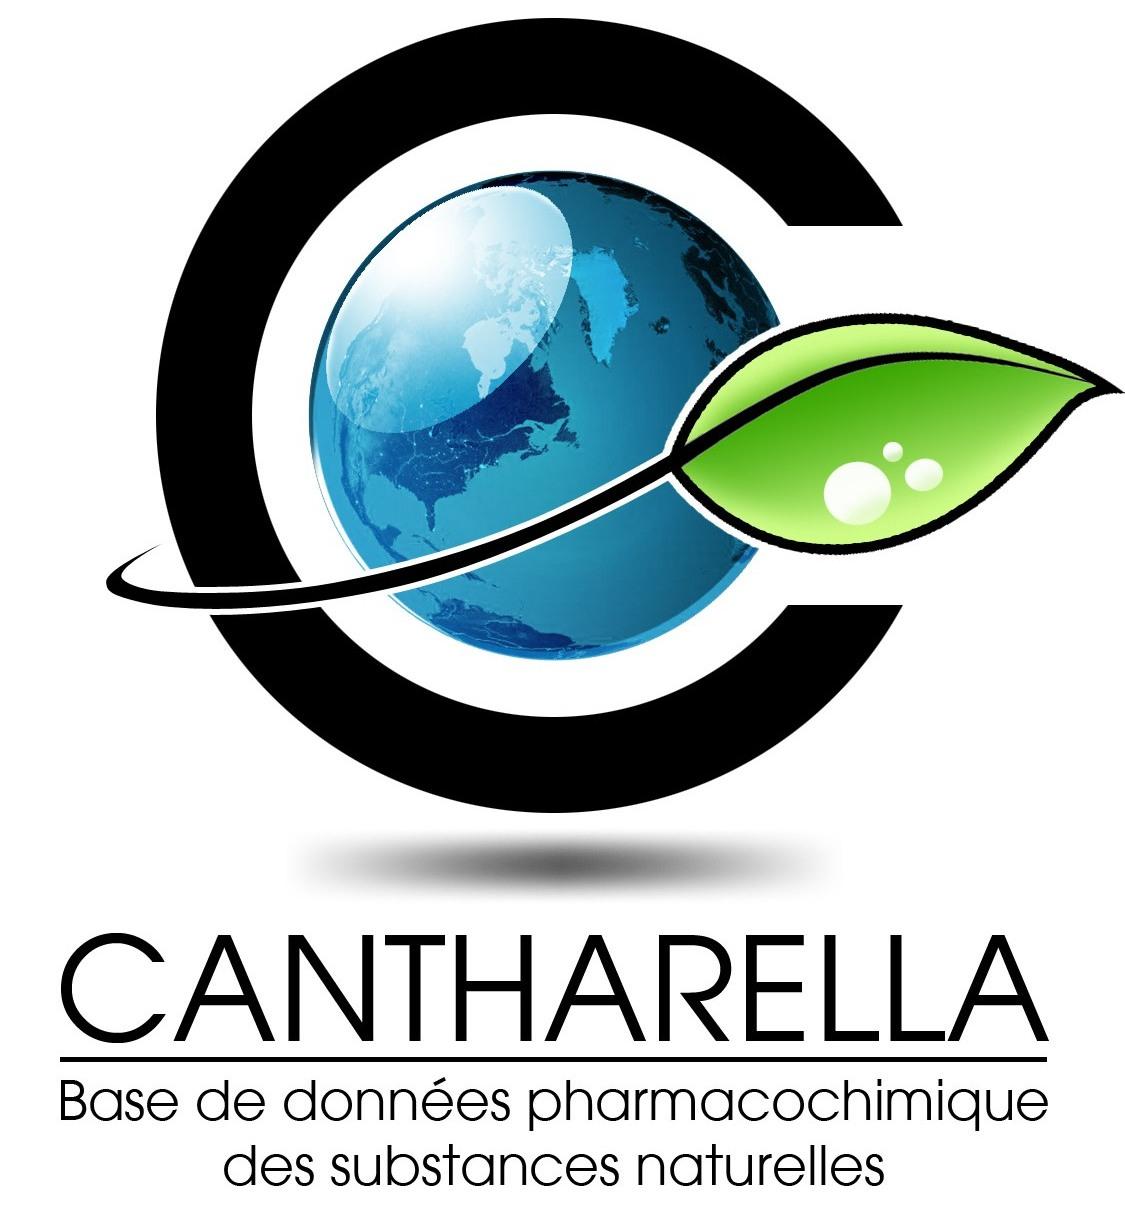 Cantharella